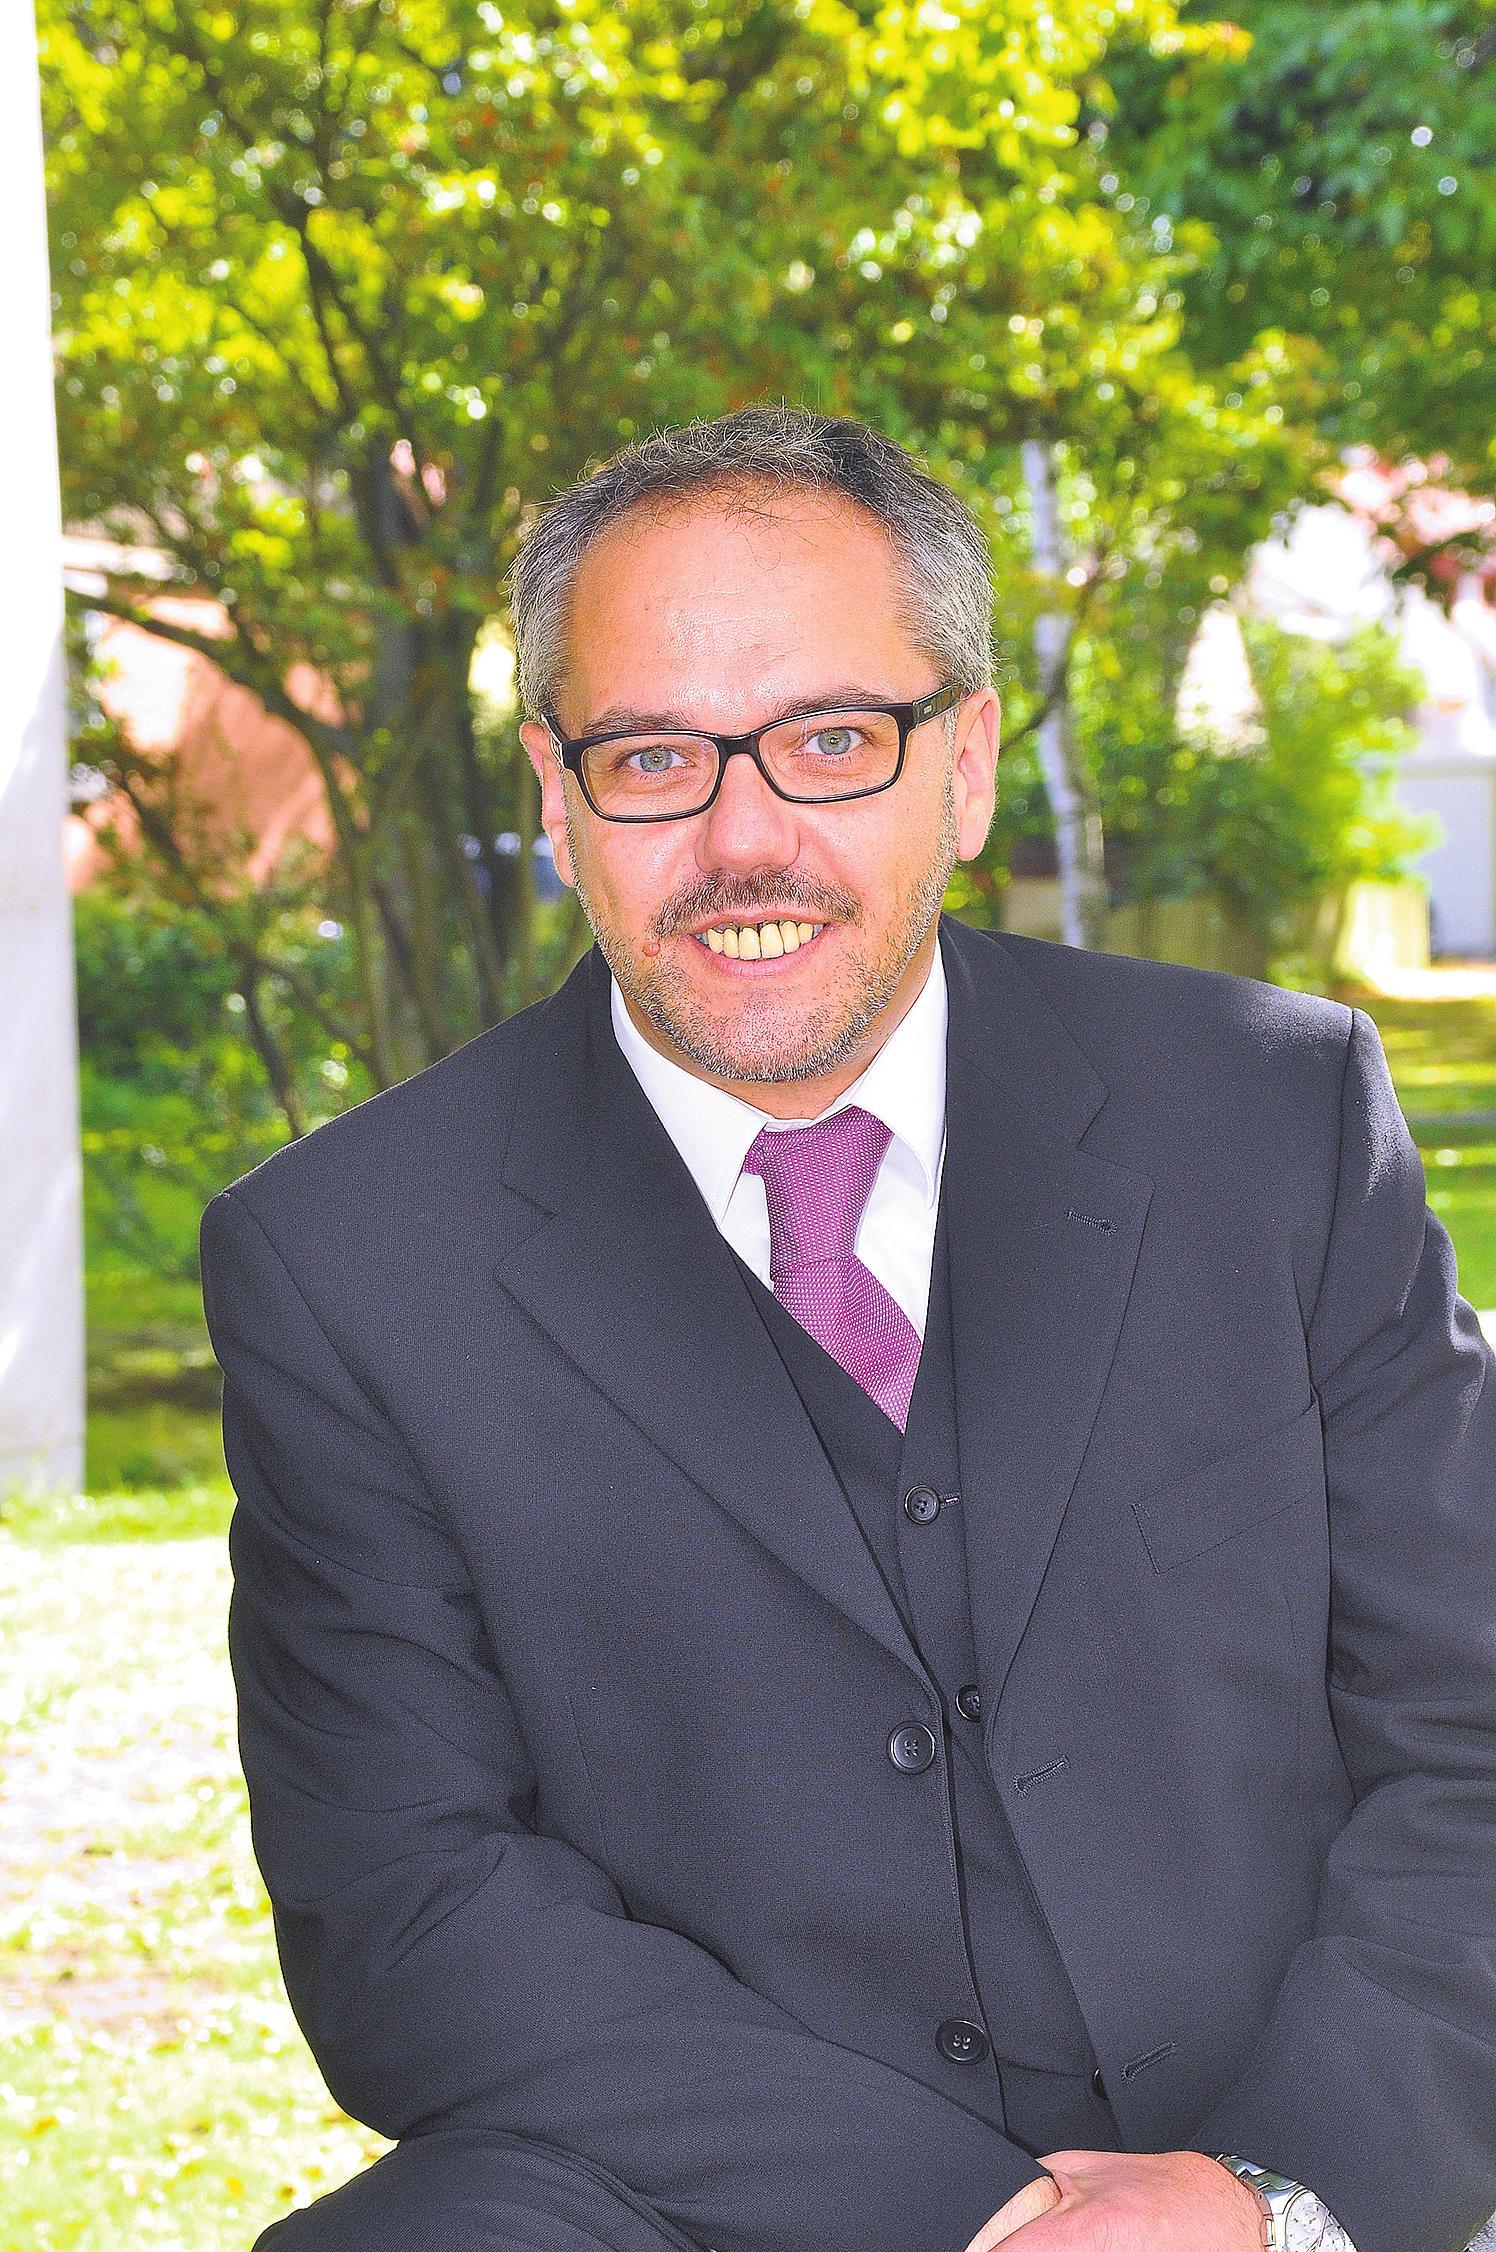 Manfred Neumann (Chorleiter)